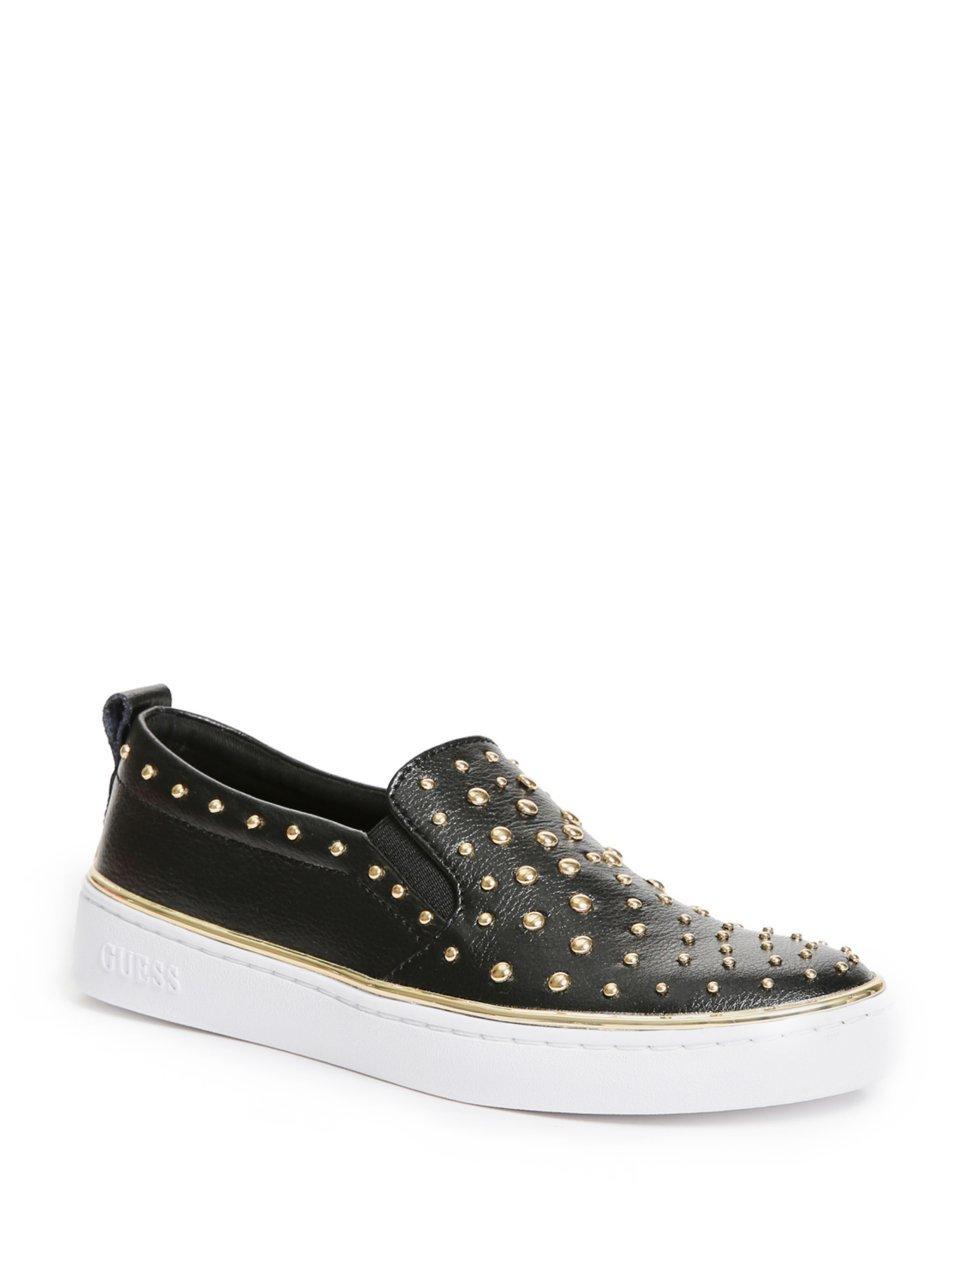 GUESS FLGOE1 LEA12 Zapatos Mujeres 38 EU|Negro